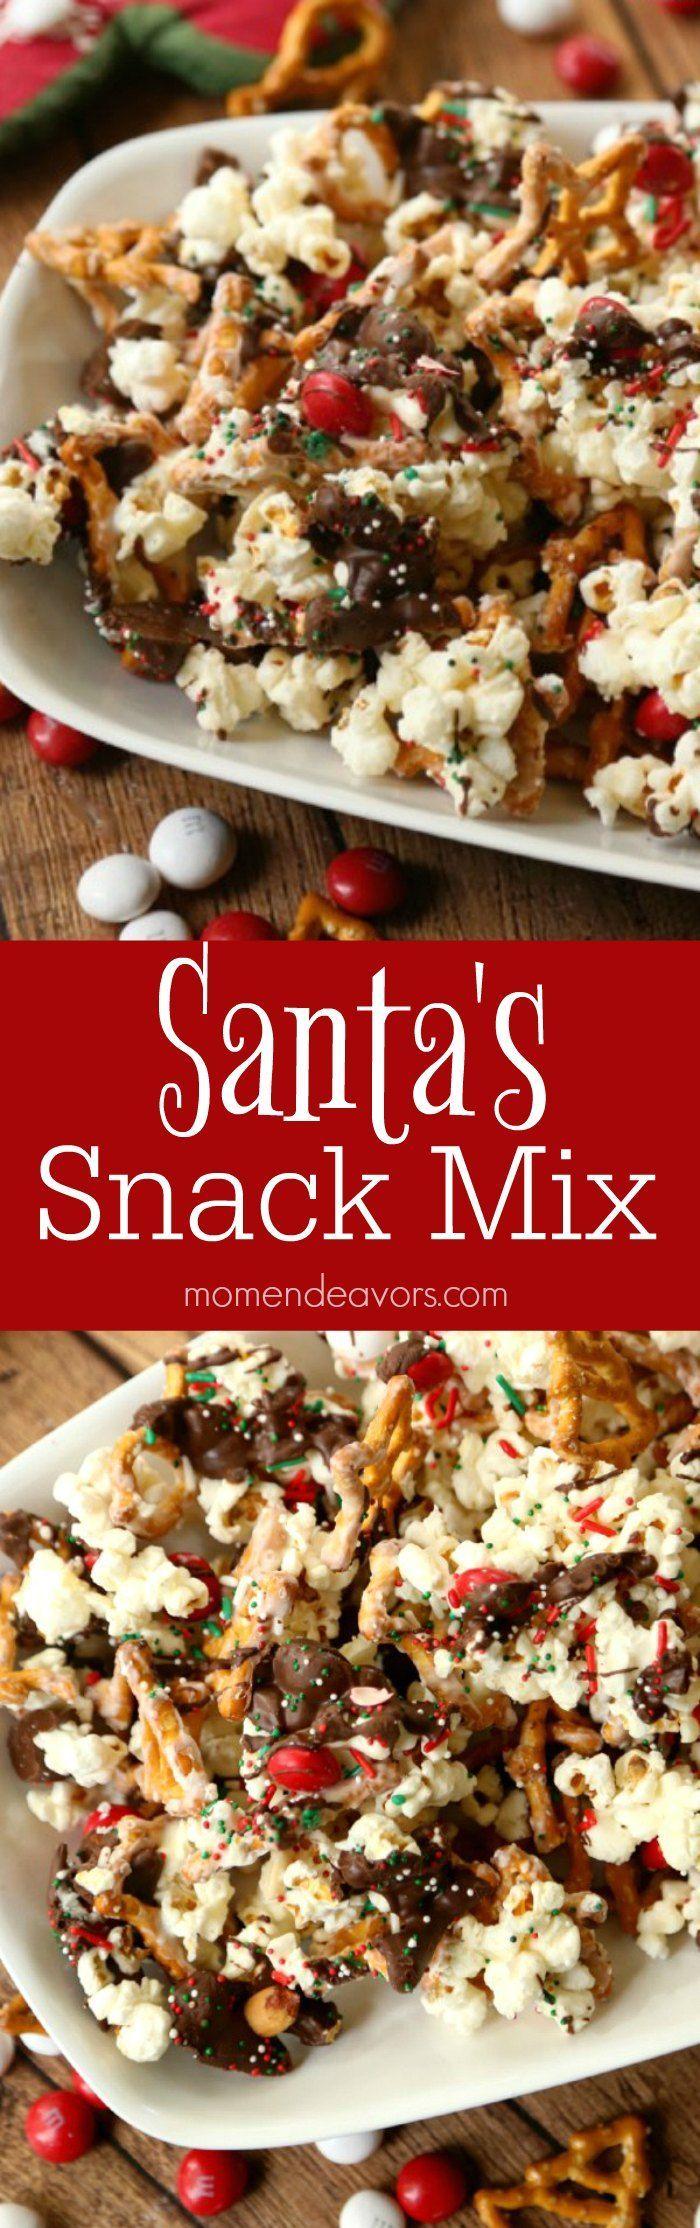 Santa's Sweet & Salty Christmas Snack Mix